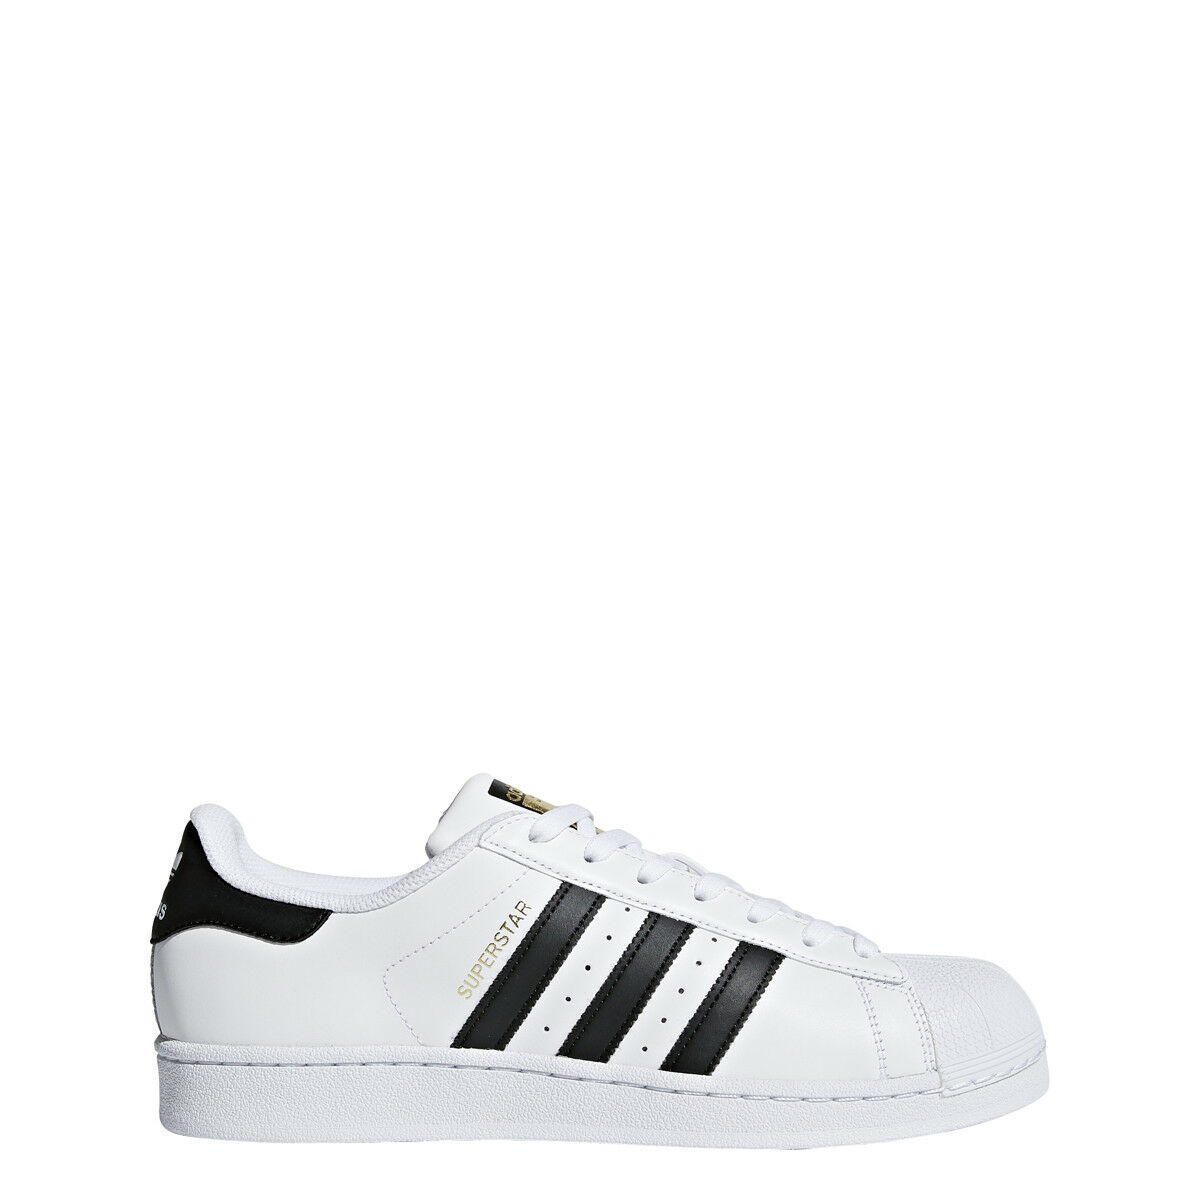 adidas Originals Men's Superstar Foundation Sneaker, White/Core Black C77124